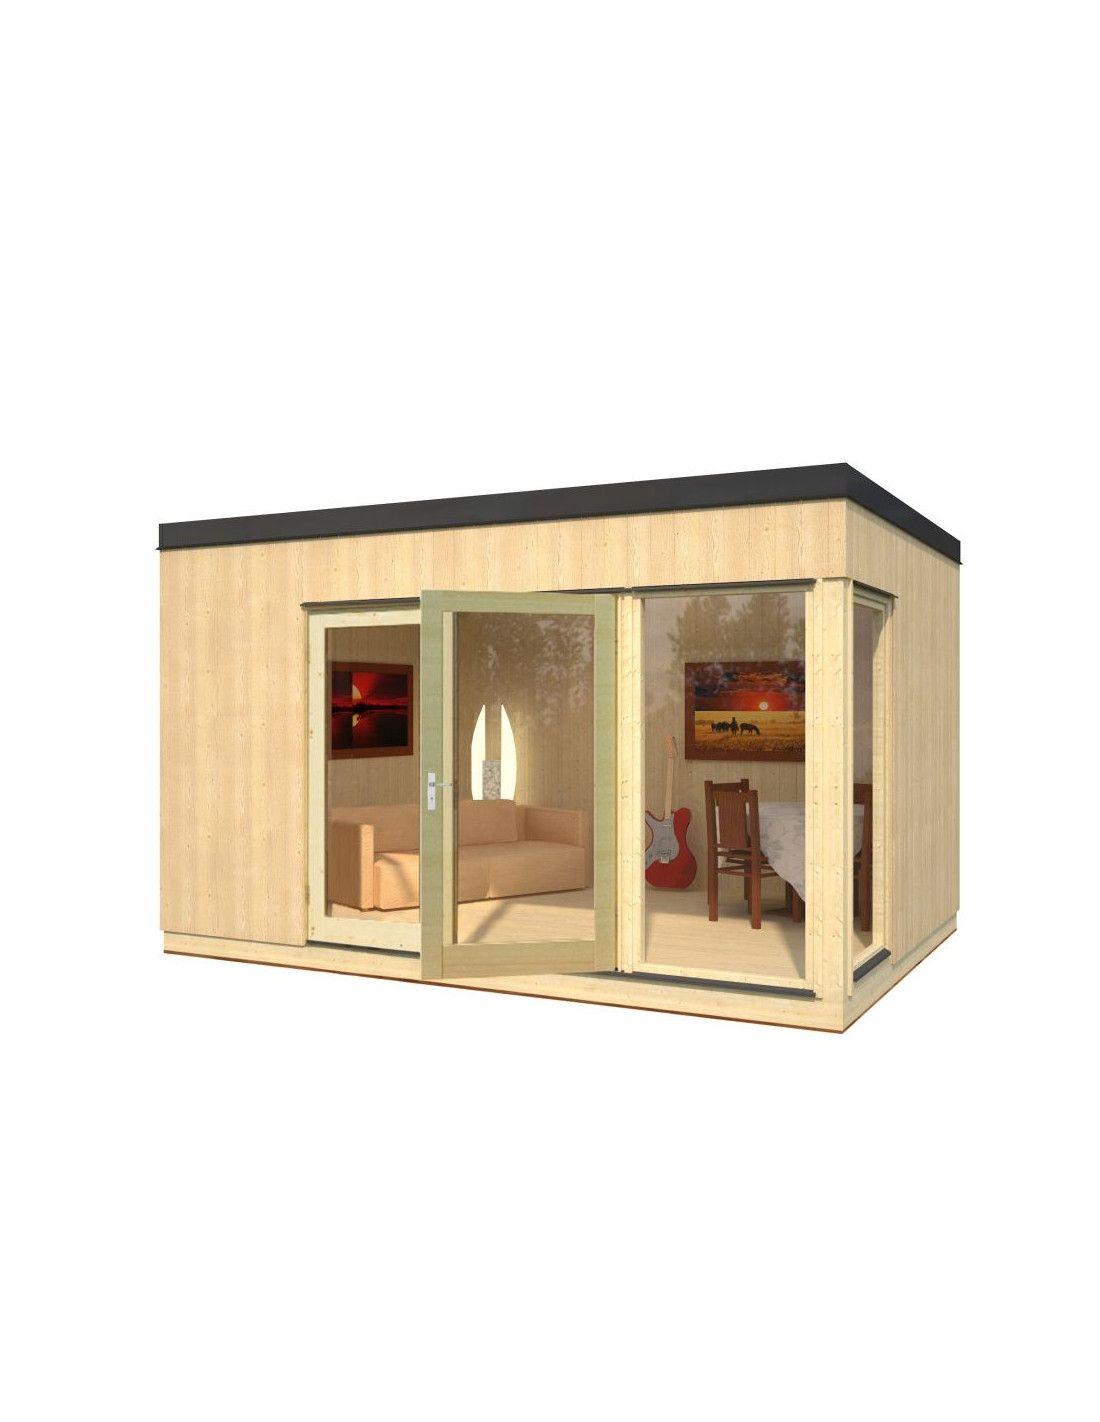 Caseta de madera estilo n rdico modelo solveig de 13 8m for Caseta herramientas